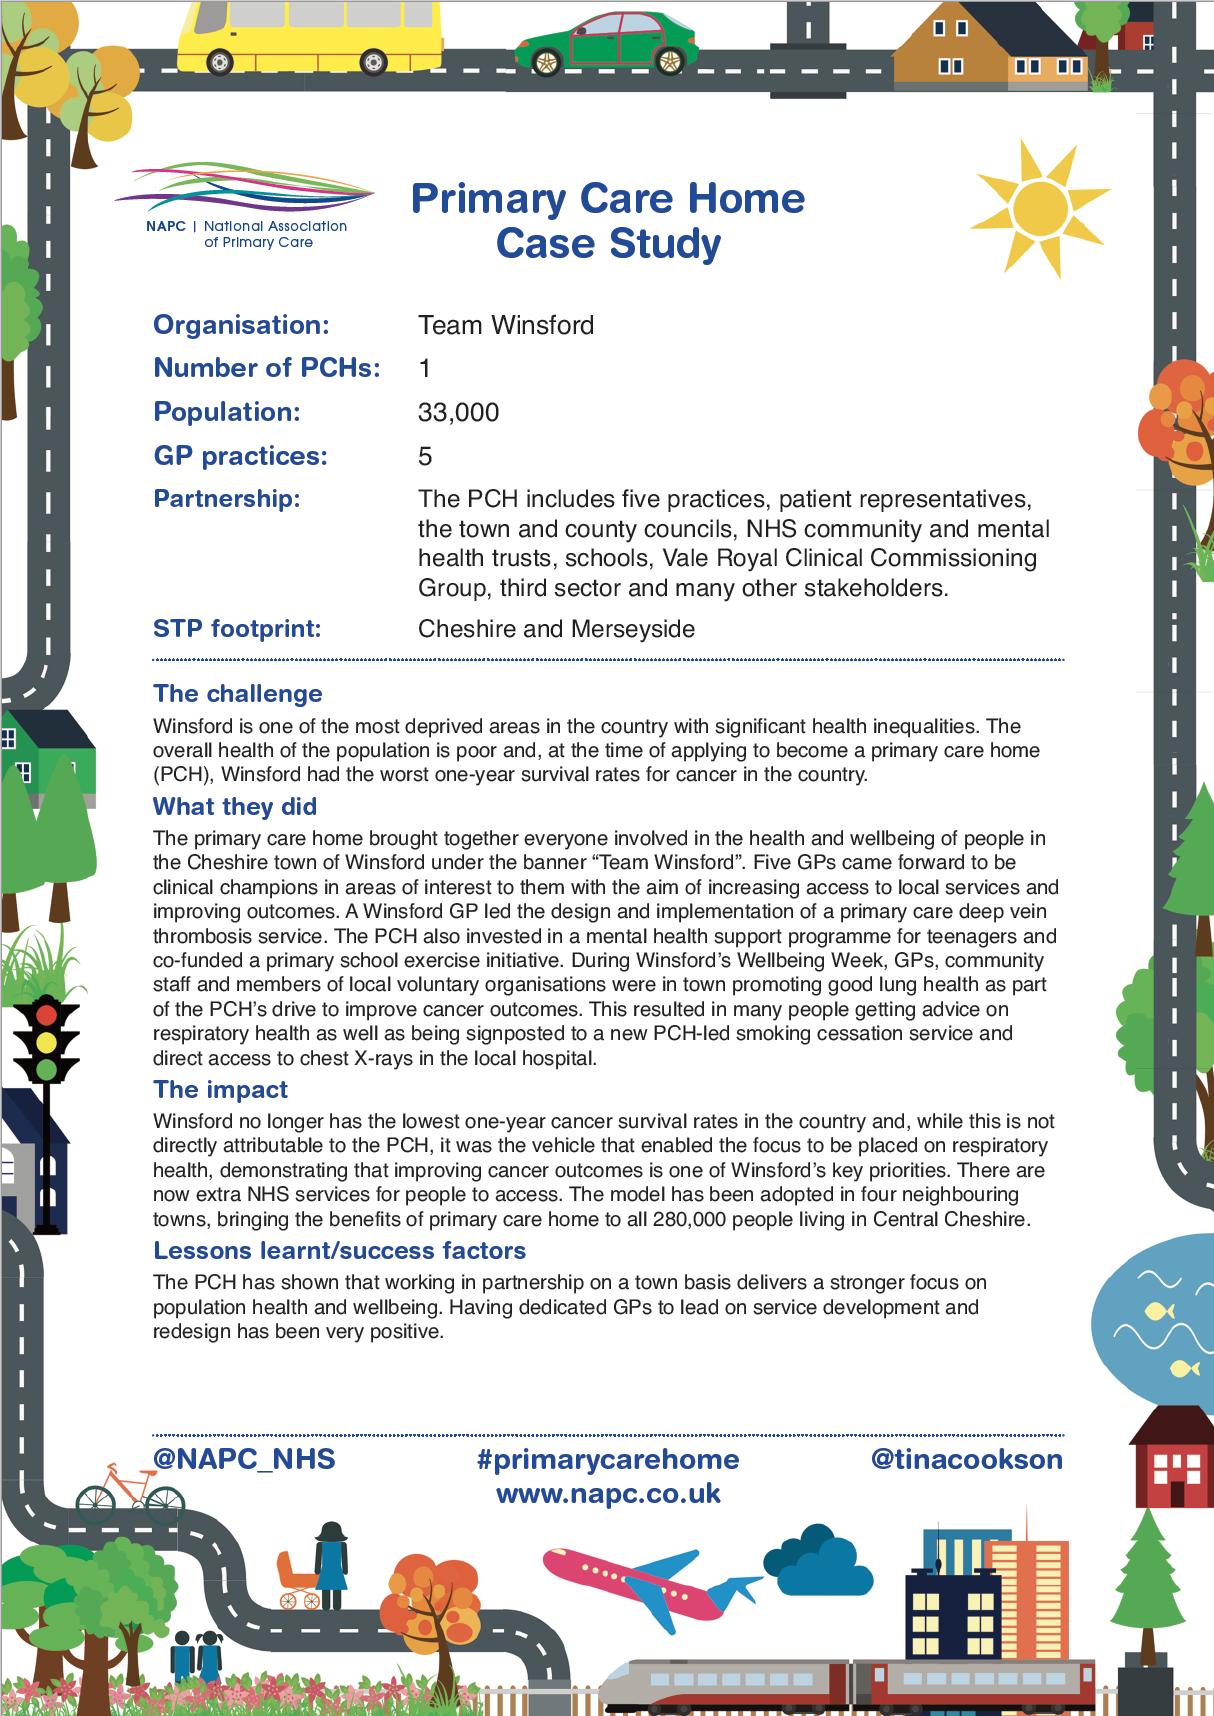 NAPC case study - Team Winsford